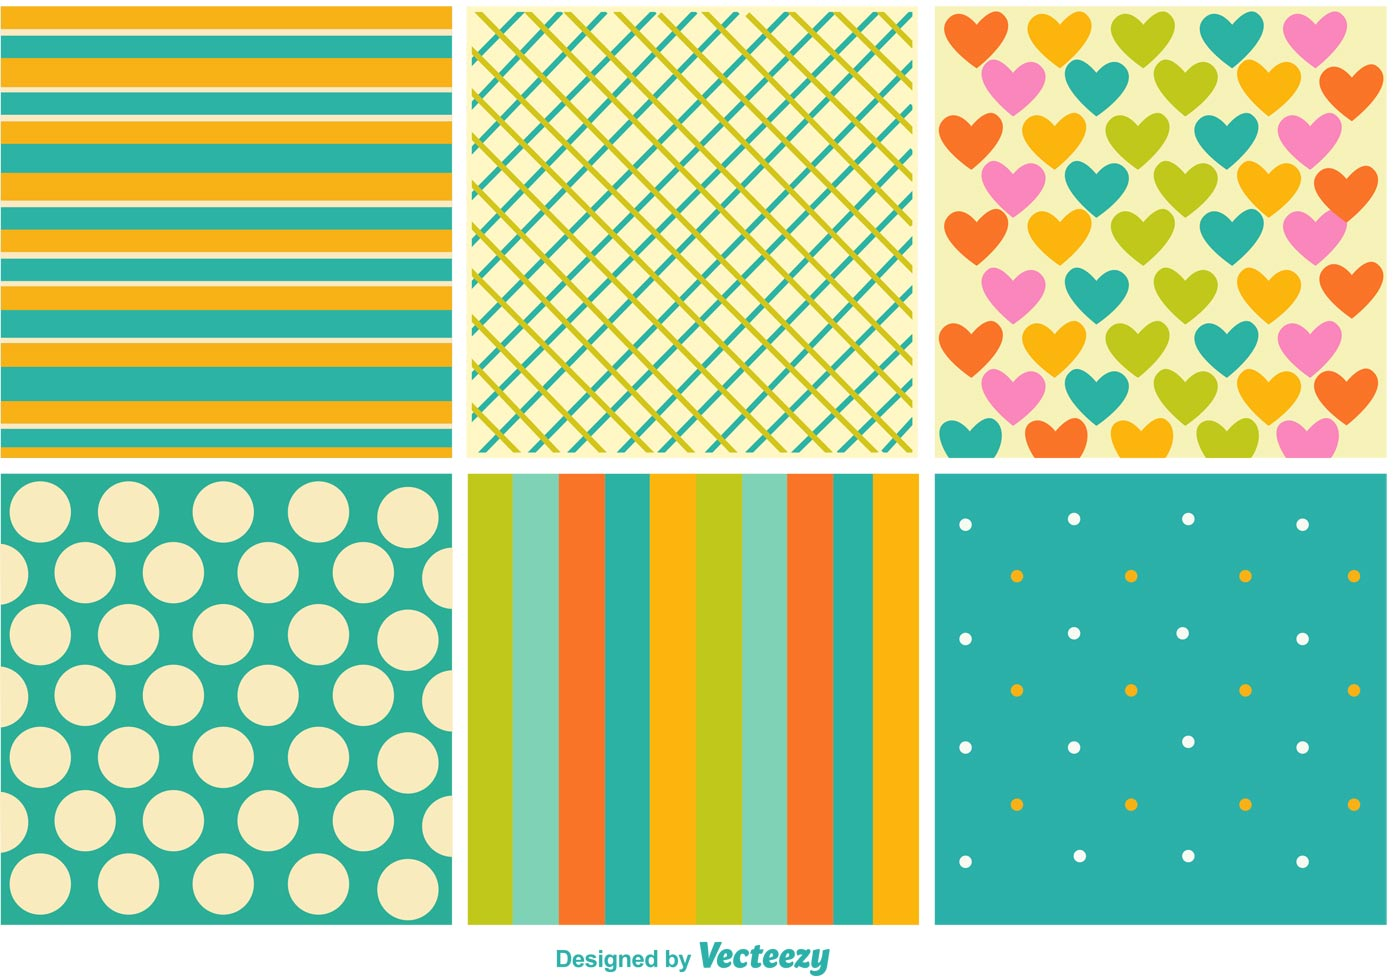 Patterns svg free Pattern Free Vector Art - (11875 Free Downloads) svg free